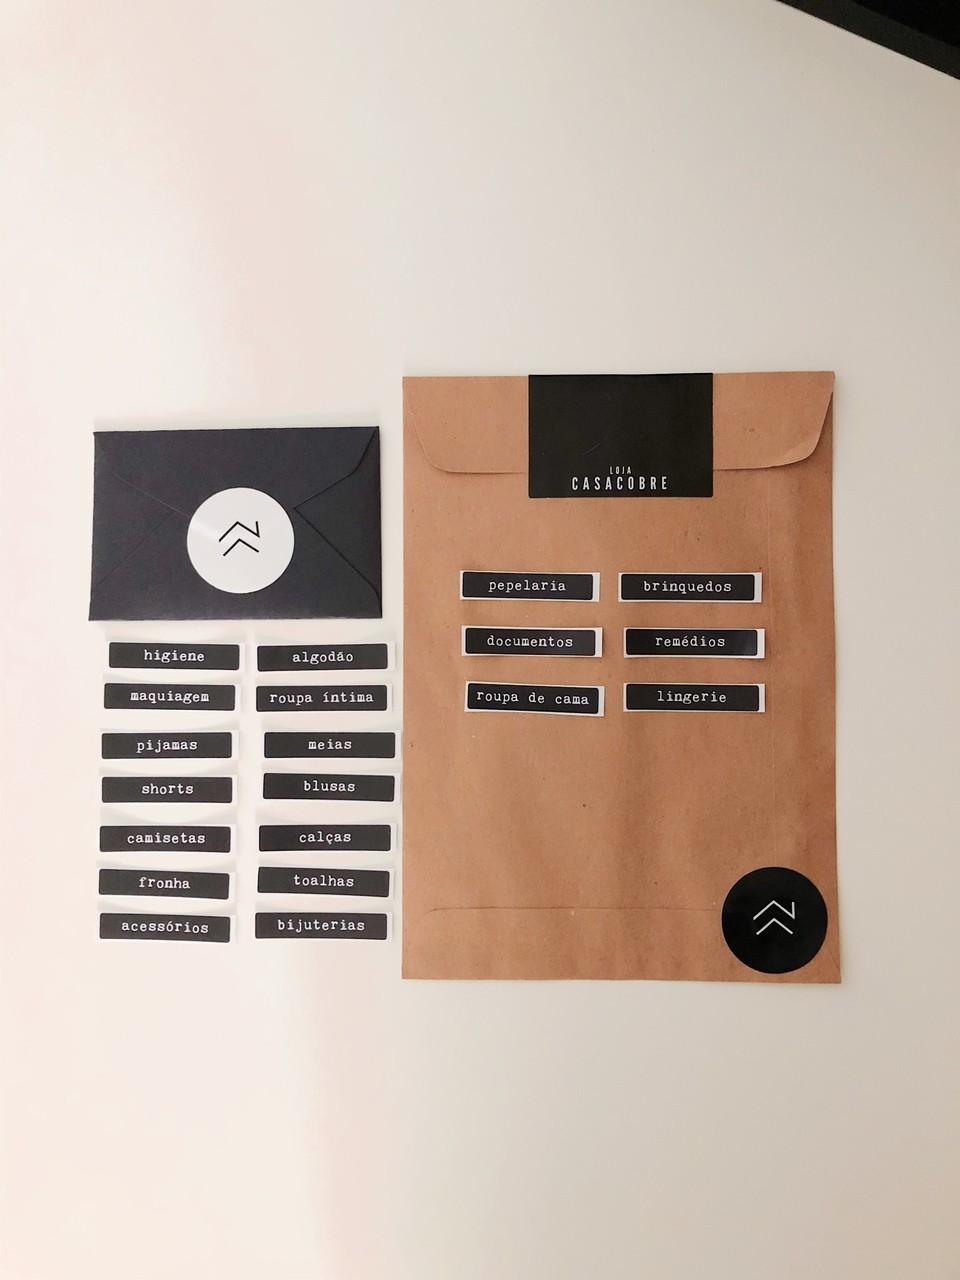 Kit 15 Rótulos Padronizado - Organização  - CASACOBRE